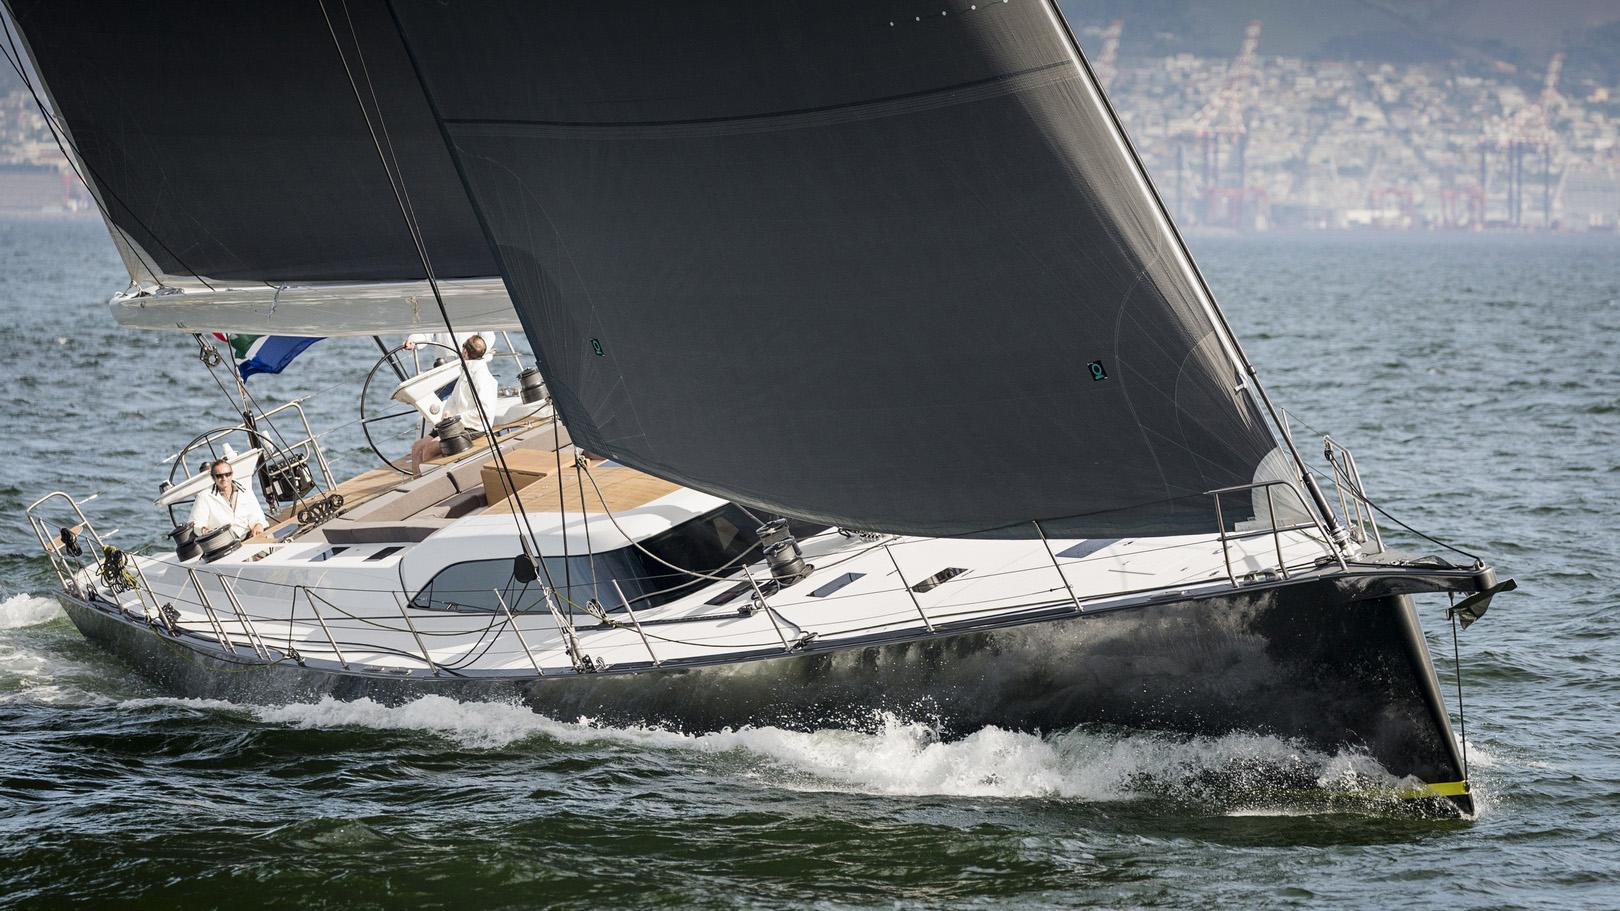 ammonite sailing yacht sws 2016 25m running half profile